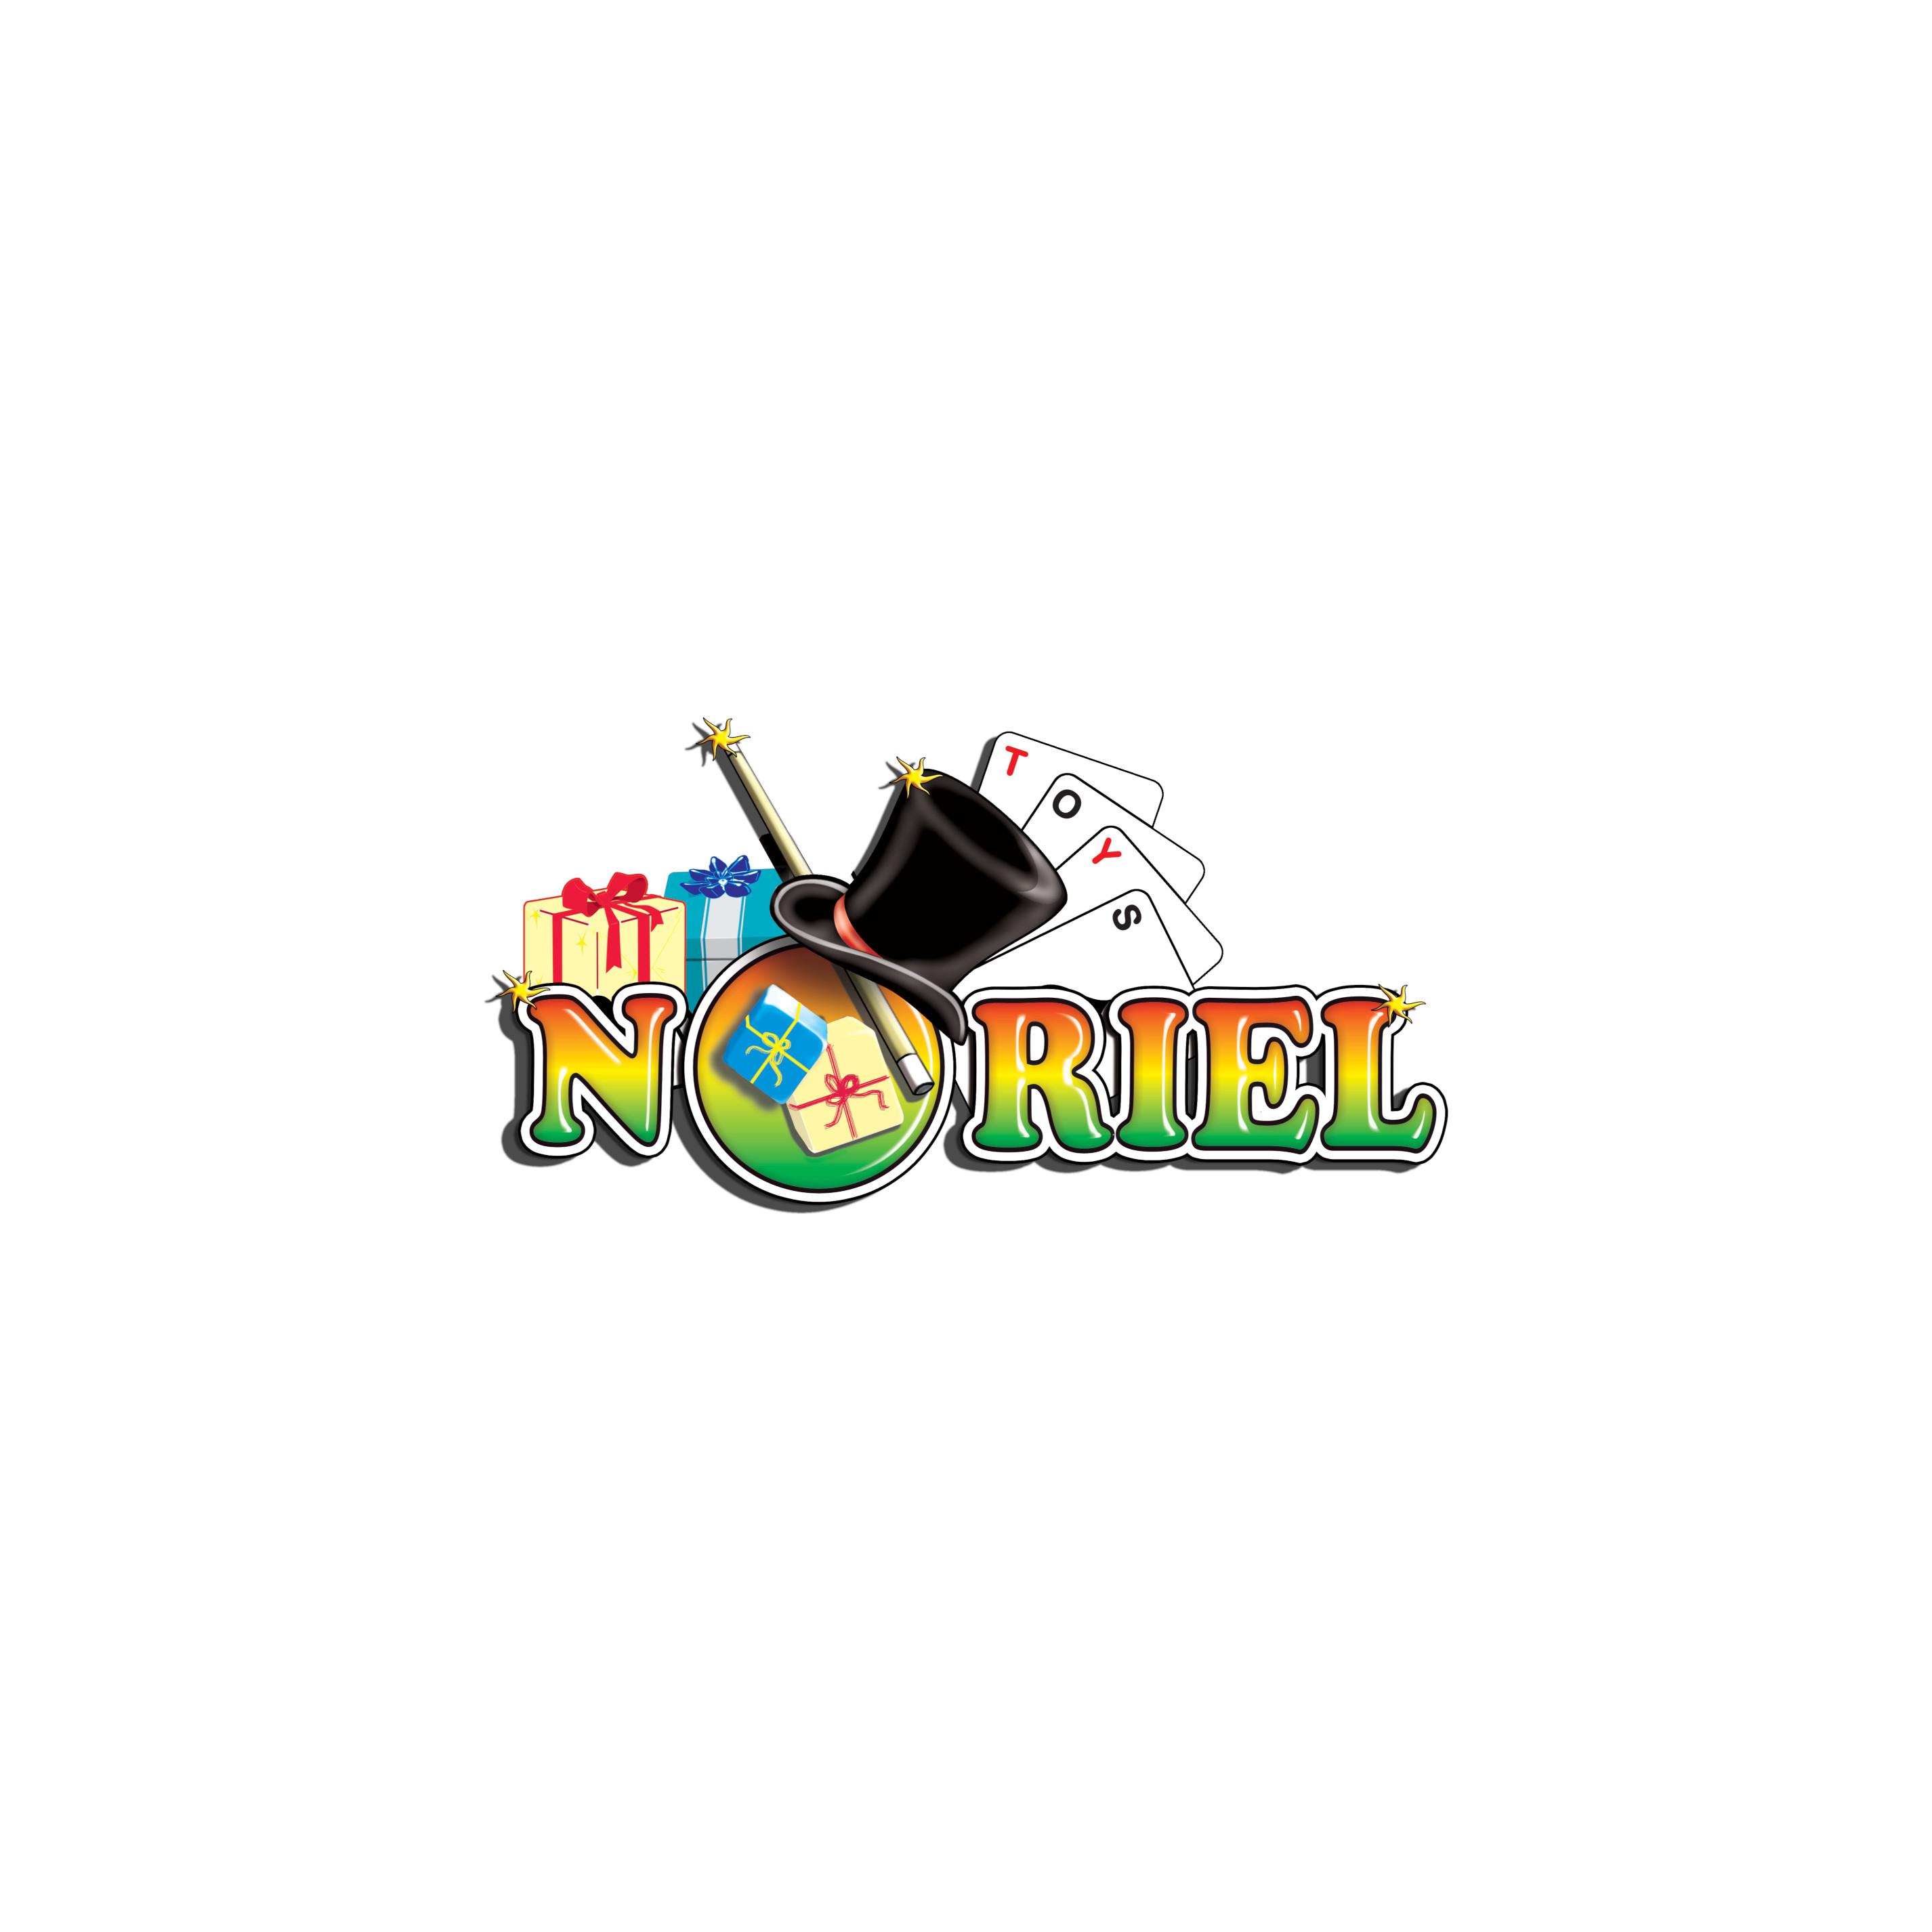 PM9262_001 Calendar Craciun Playmobil - Ferma calutilor